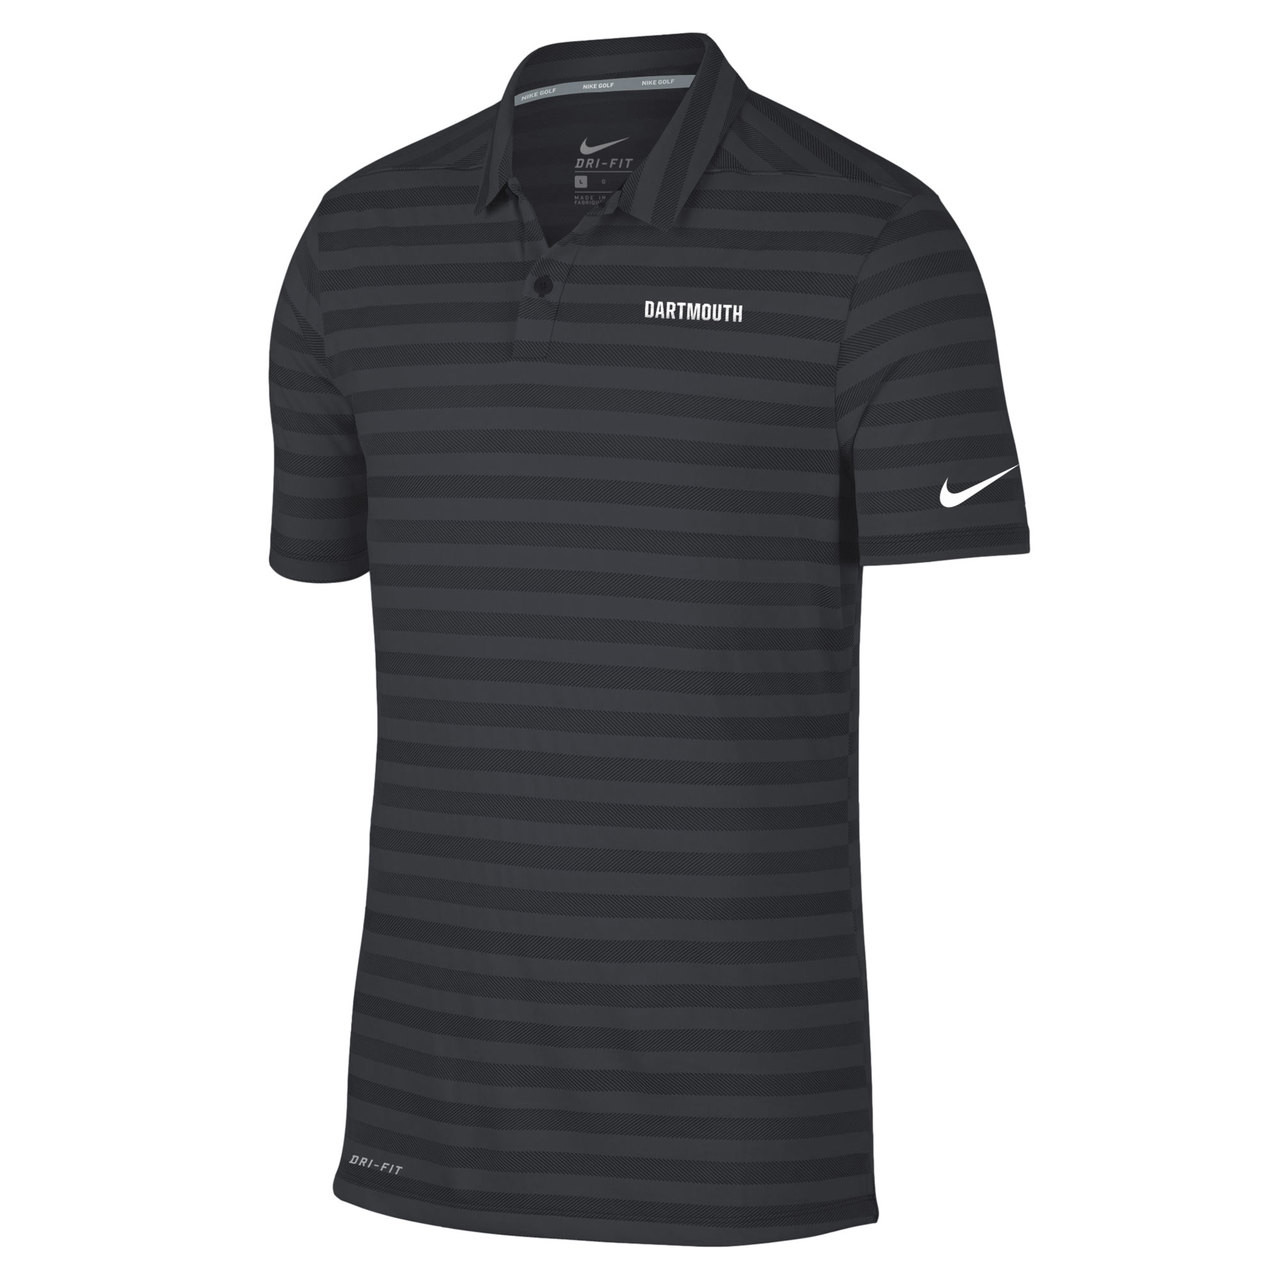 Polo Stripe Nike Dry Co Dartmouth Op Men's 7qUpOwtxT